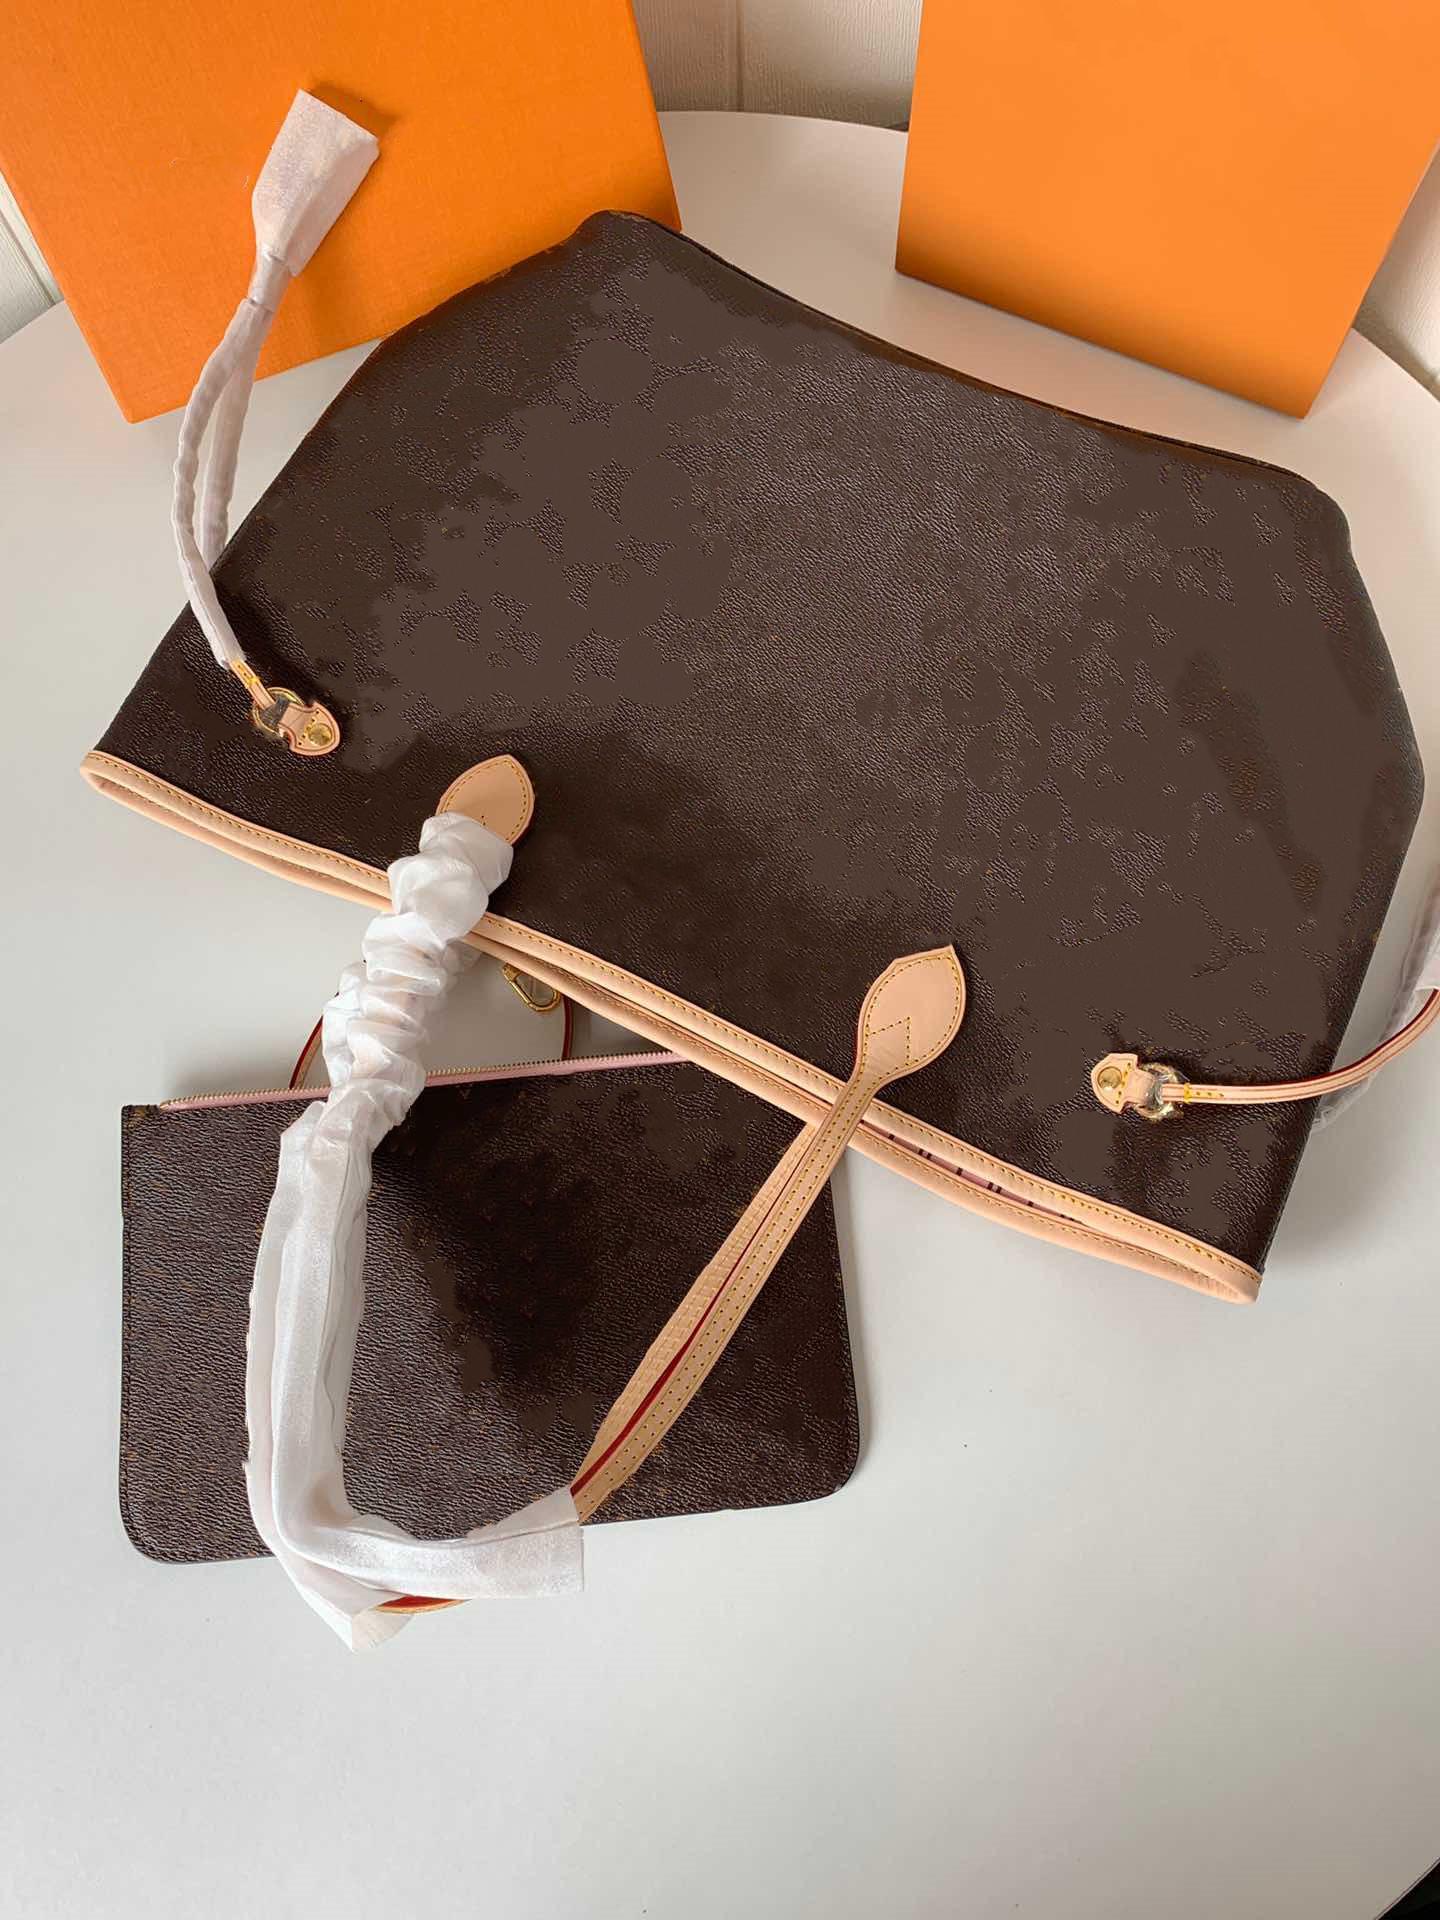 2020 new women leather handbags female mother package bag hand mother bill of lading shoulder bag women bag+Small bag